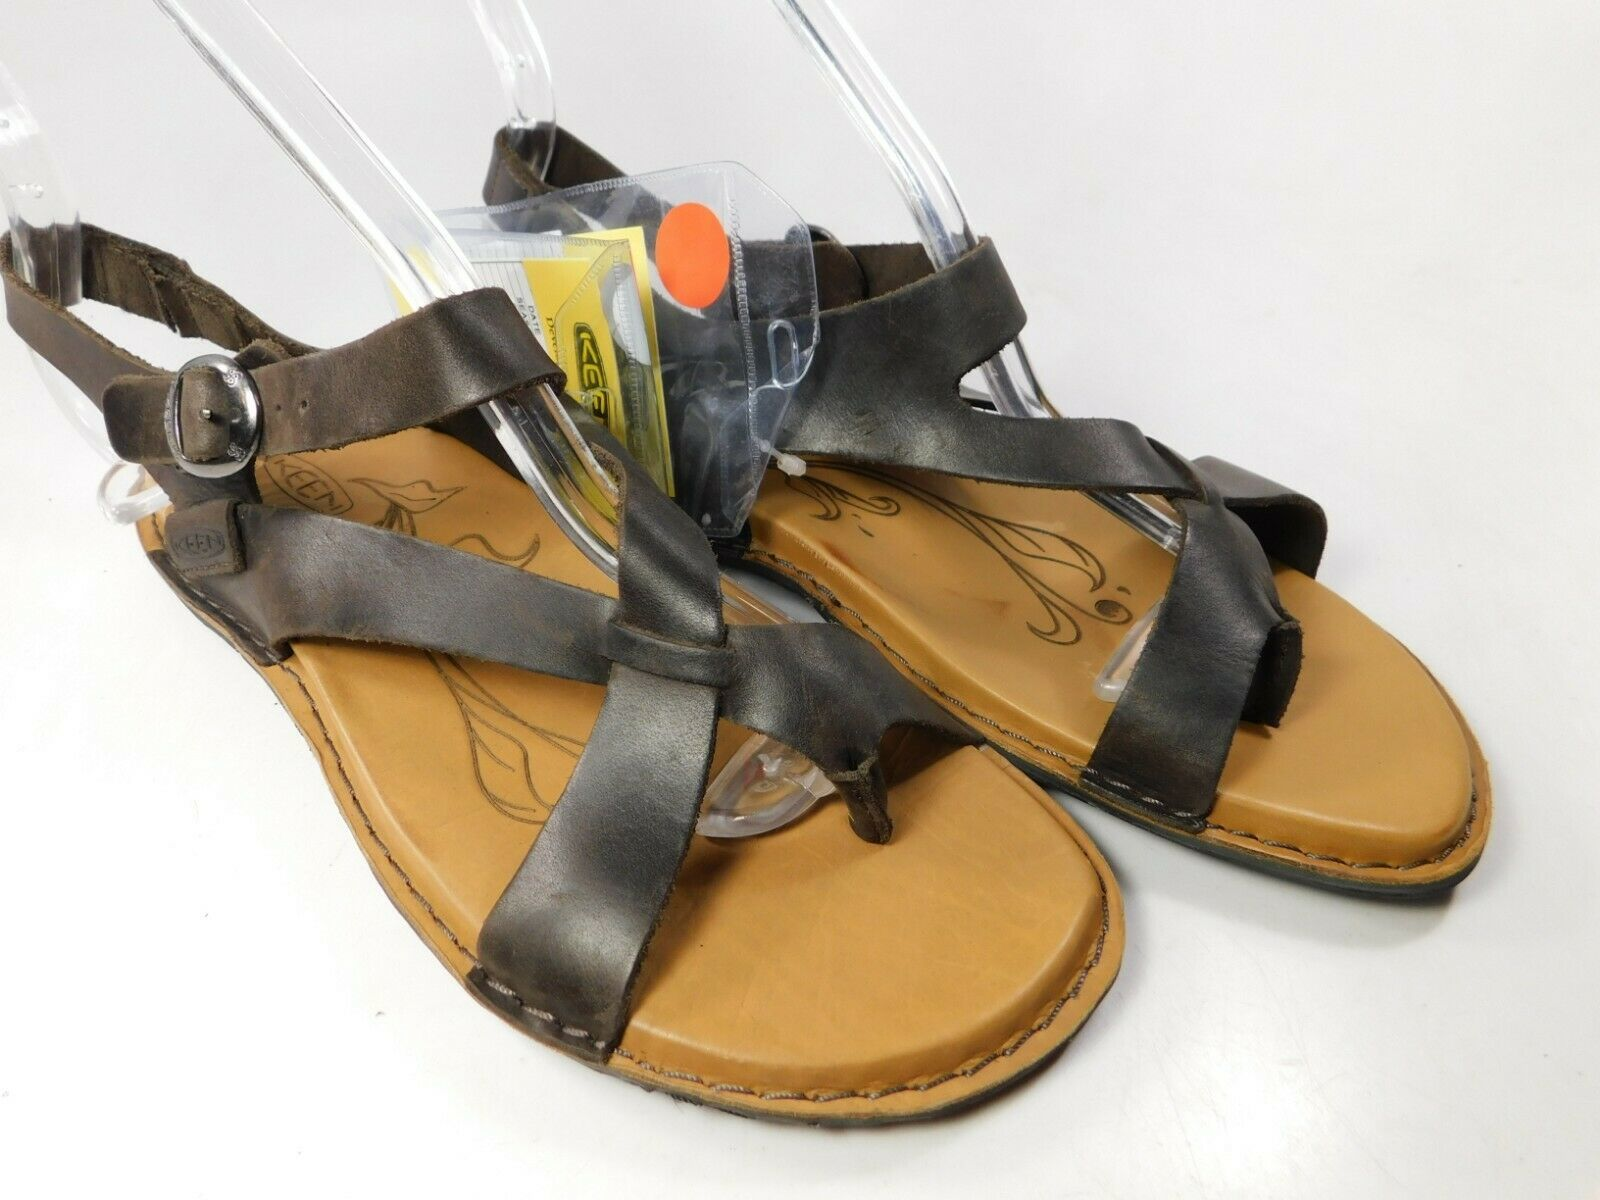 Keen Sofia II Sz US 7 M (B) Eu 37.5 Femmes Cuir Sandales Décontractées